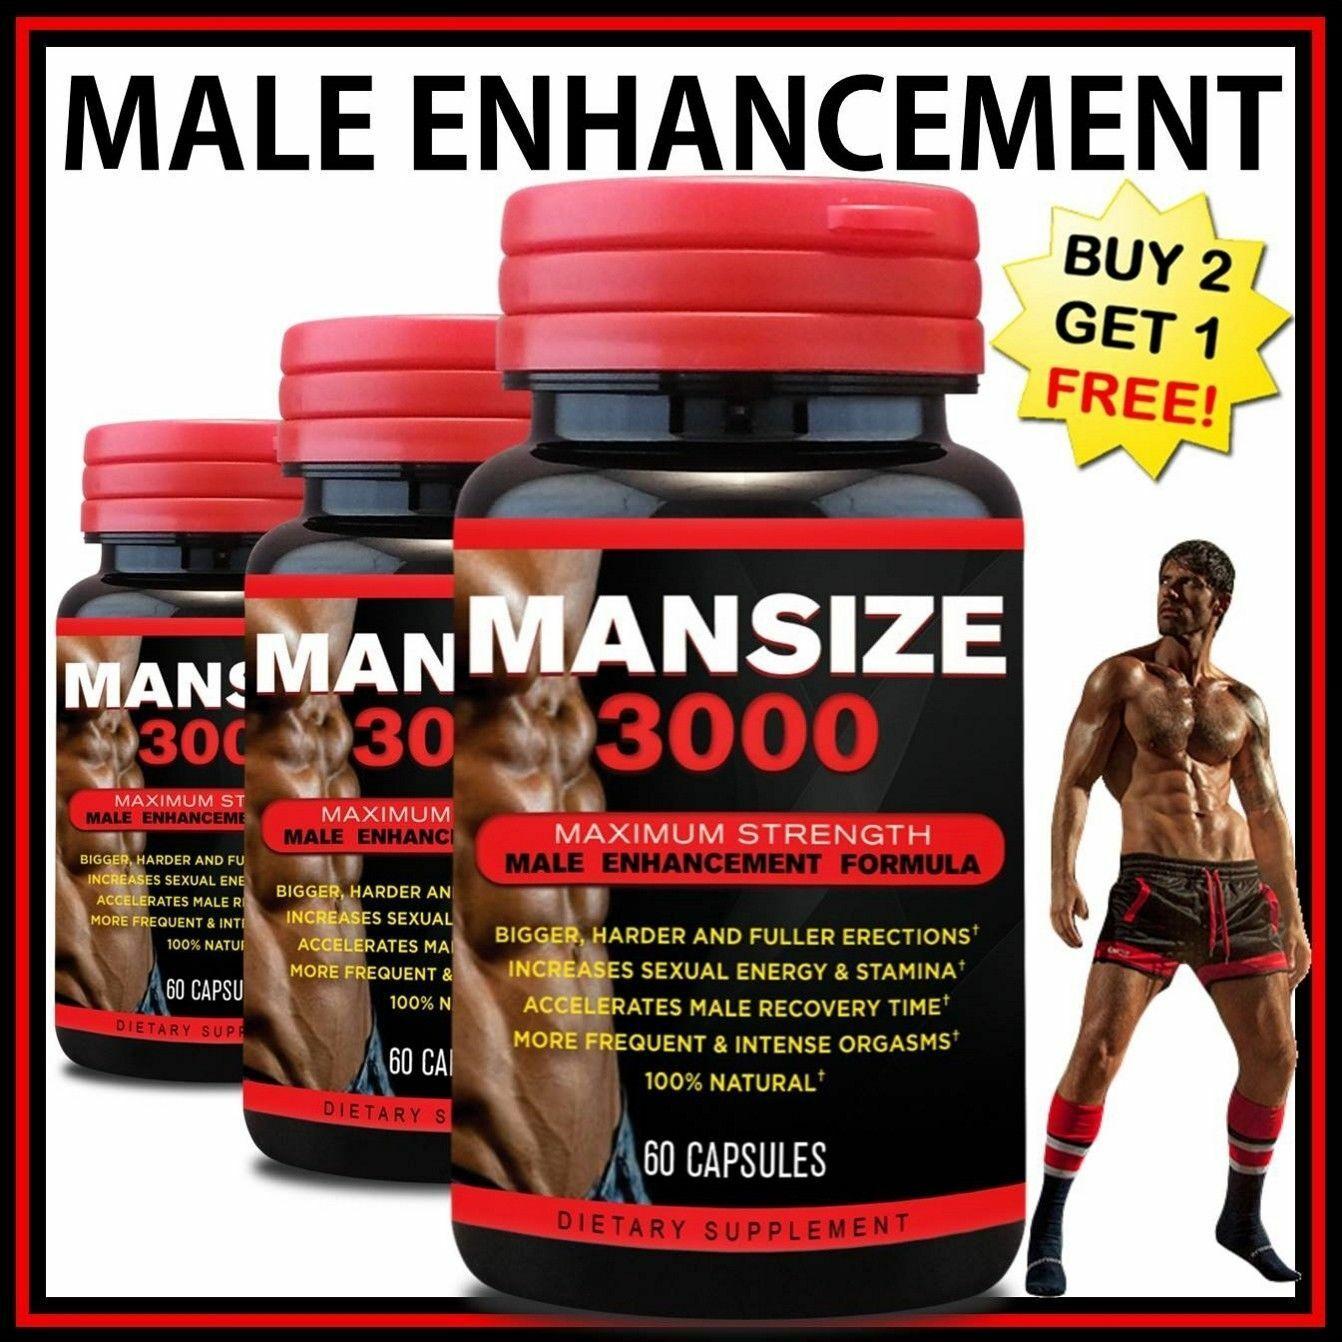 MANSIZE 3000 Thicker Wider Longer Maximum Penis Enlargement Enhancement Pills